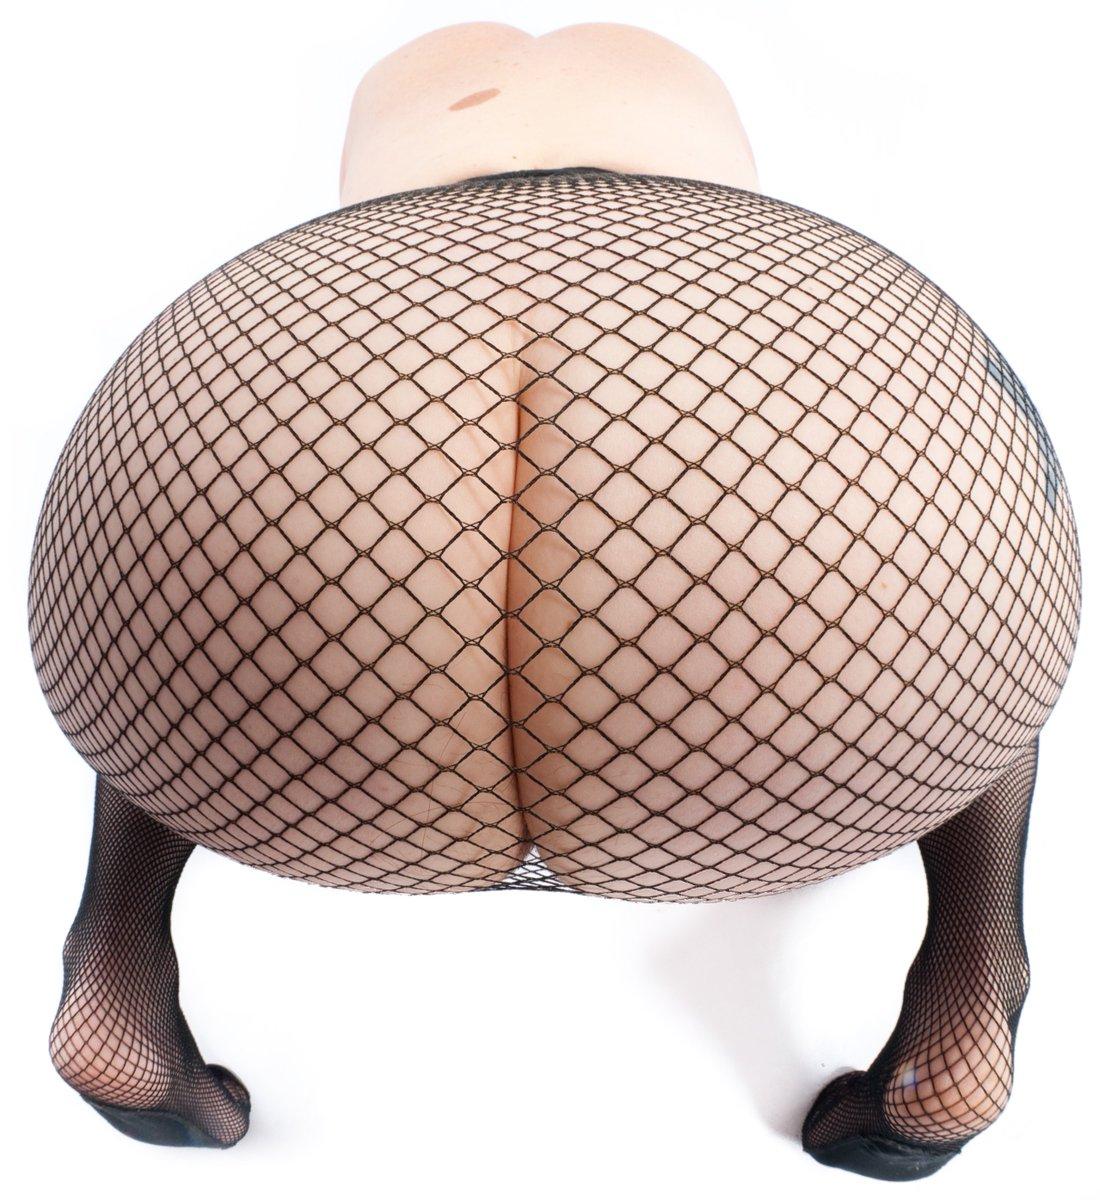 2 pic. Butt is it art? pD6AfB6iA5